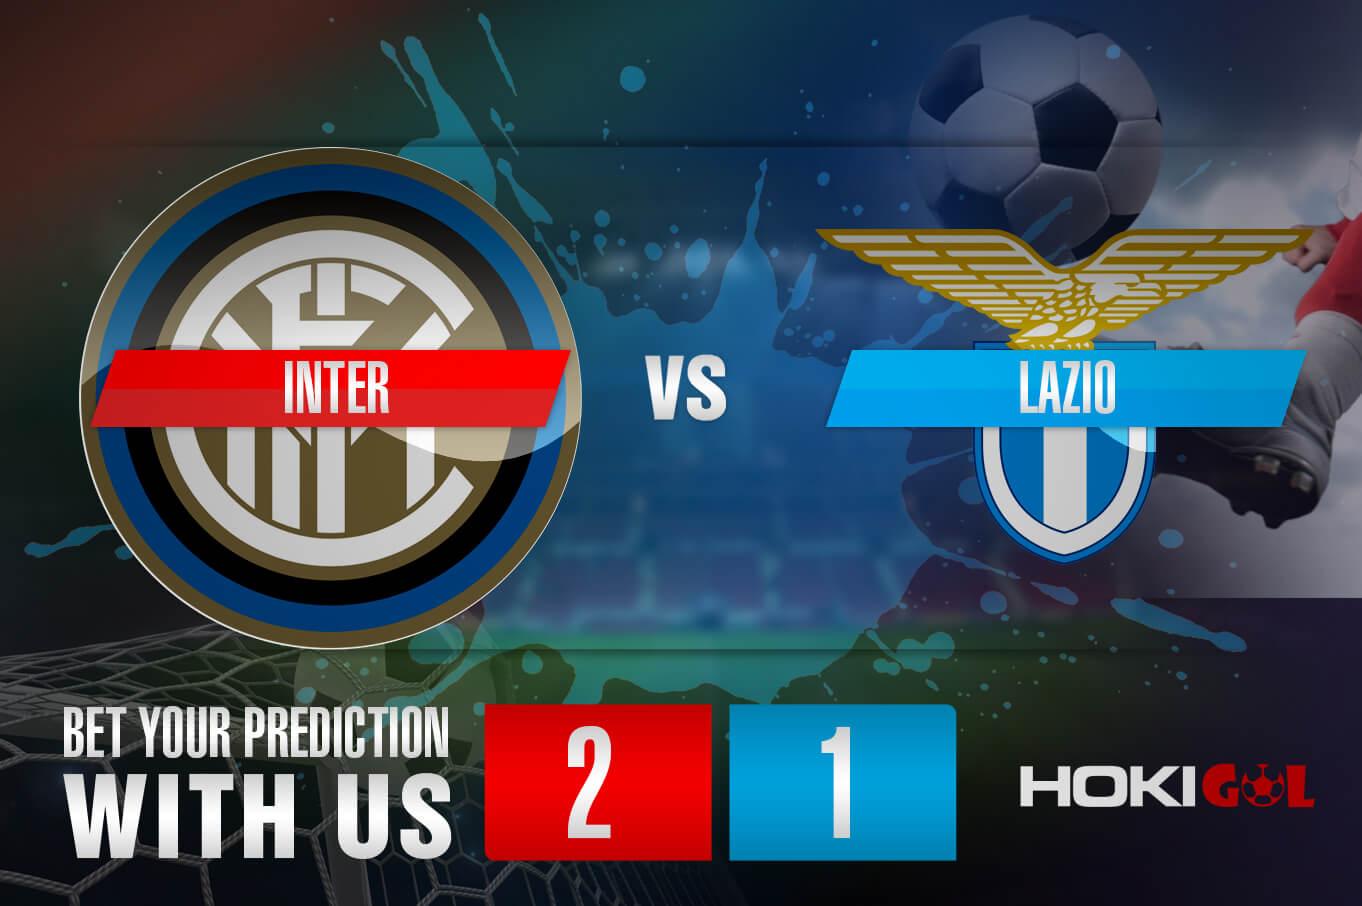 Prediksi Bola Inter Vs Lazio 15 Februari 2021